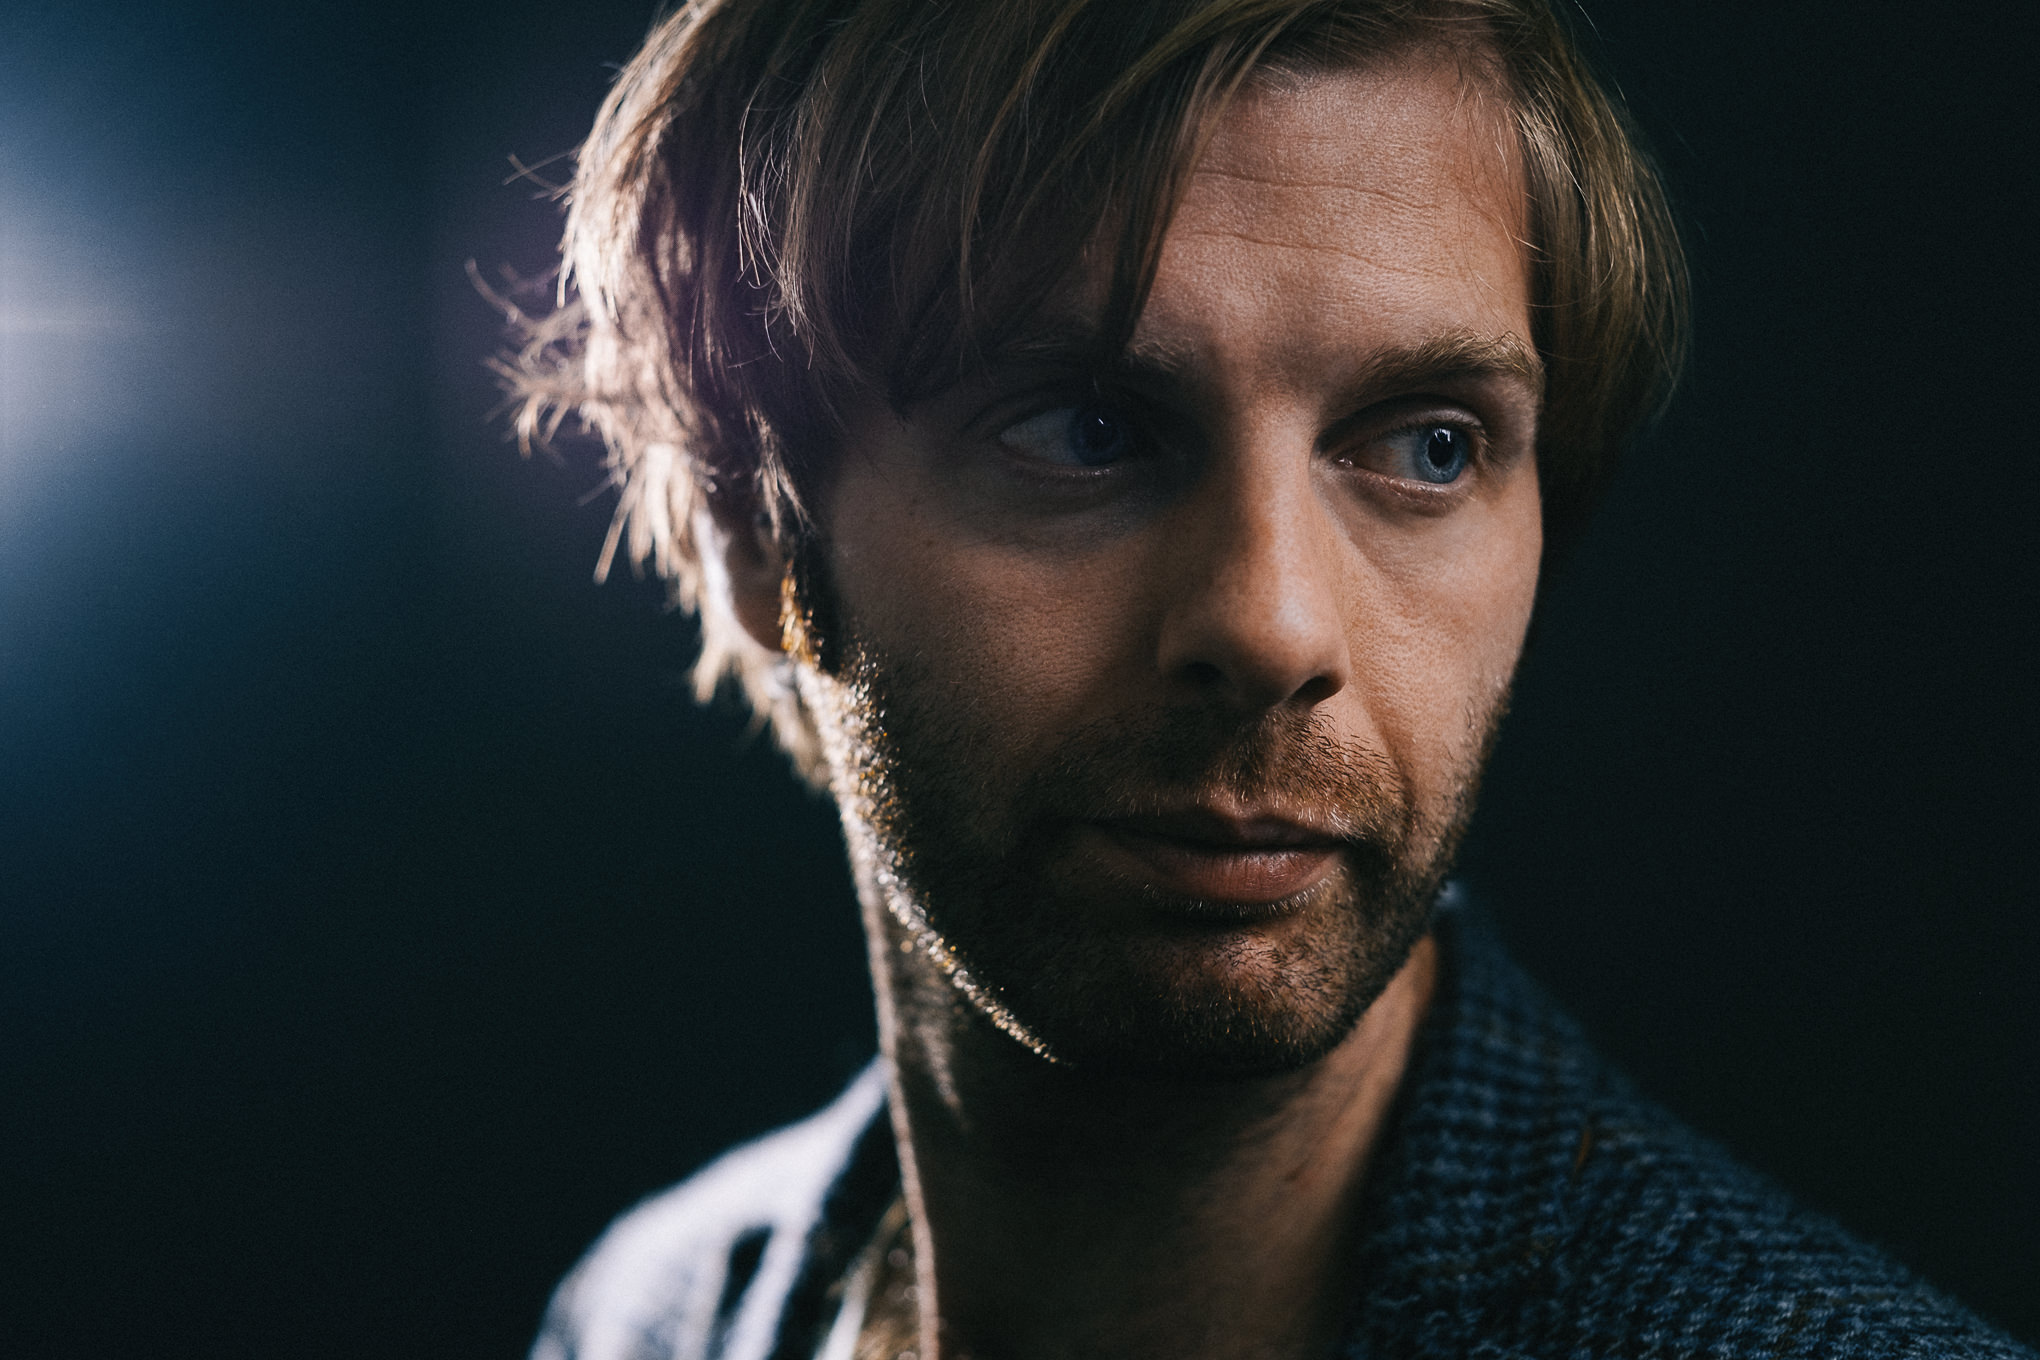 Andrew Nicol. Musician